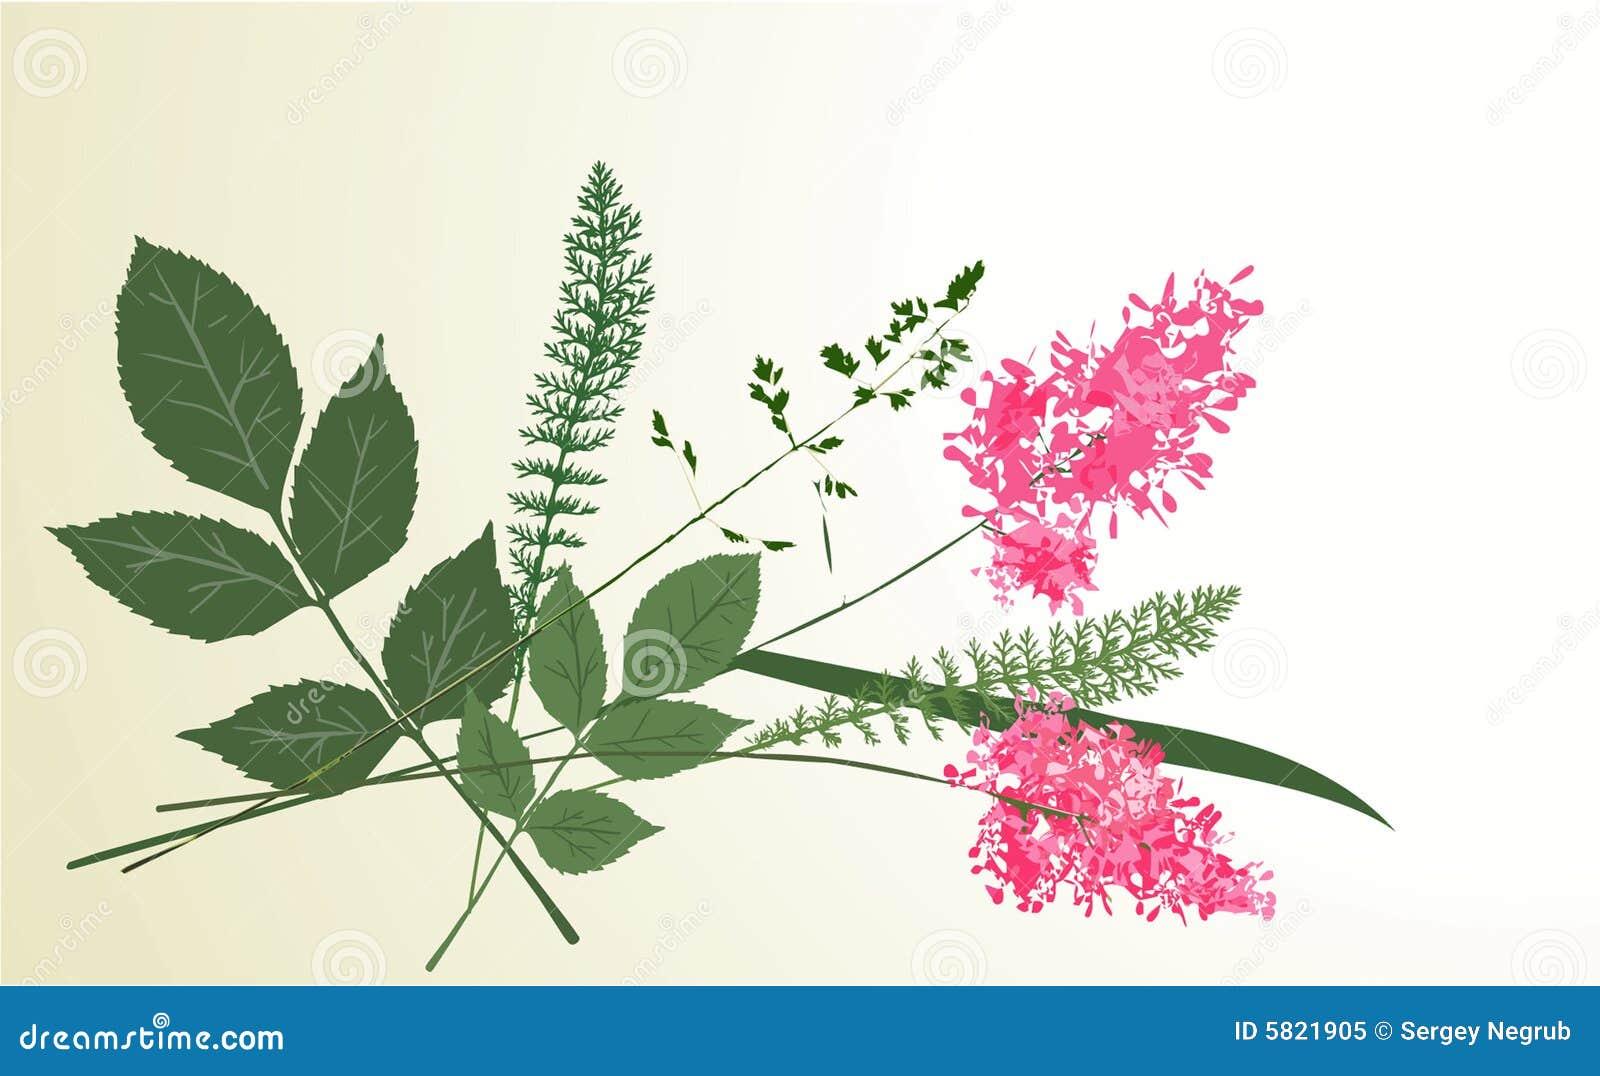 Herbarium bloemen